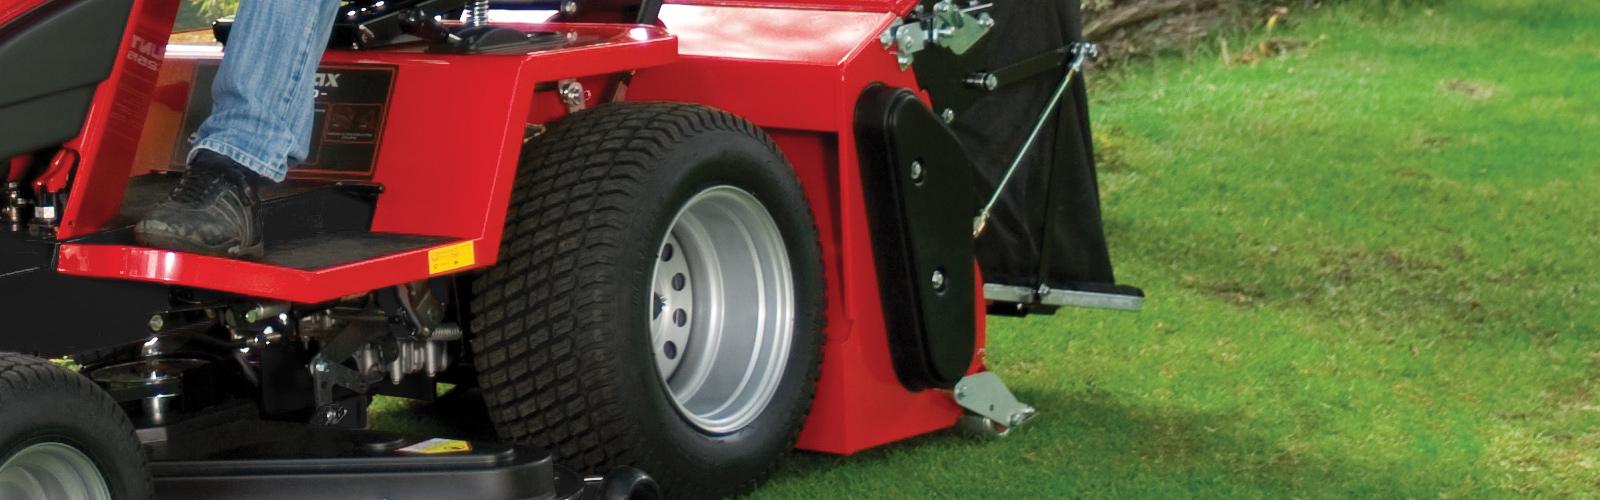 Countax garden tractor a series powered grass collector